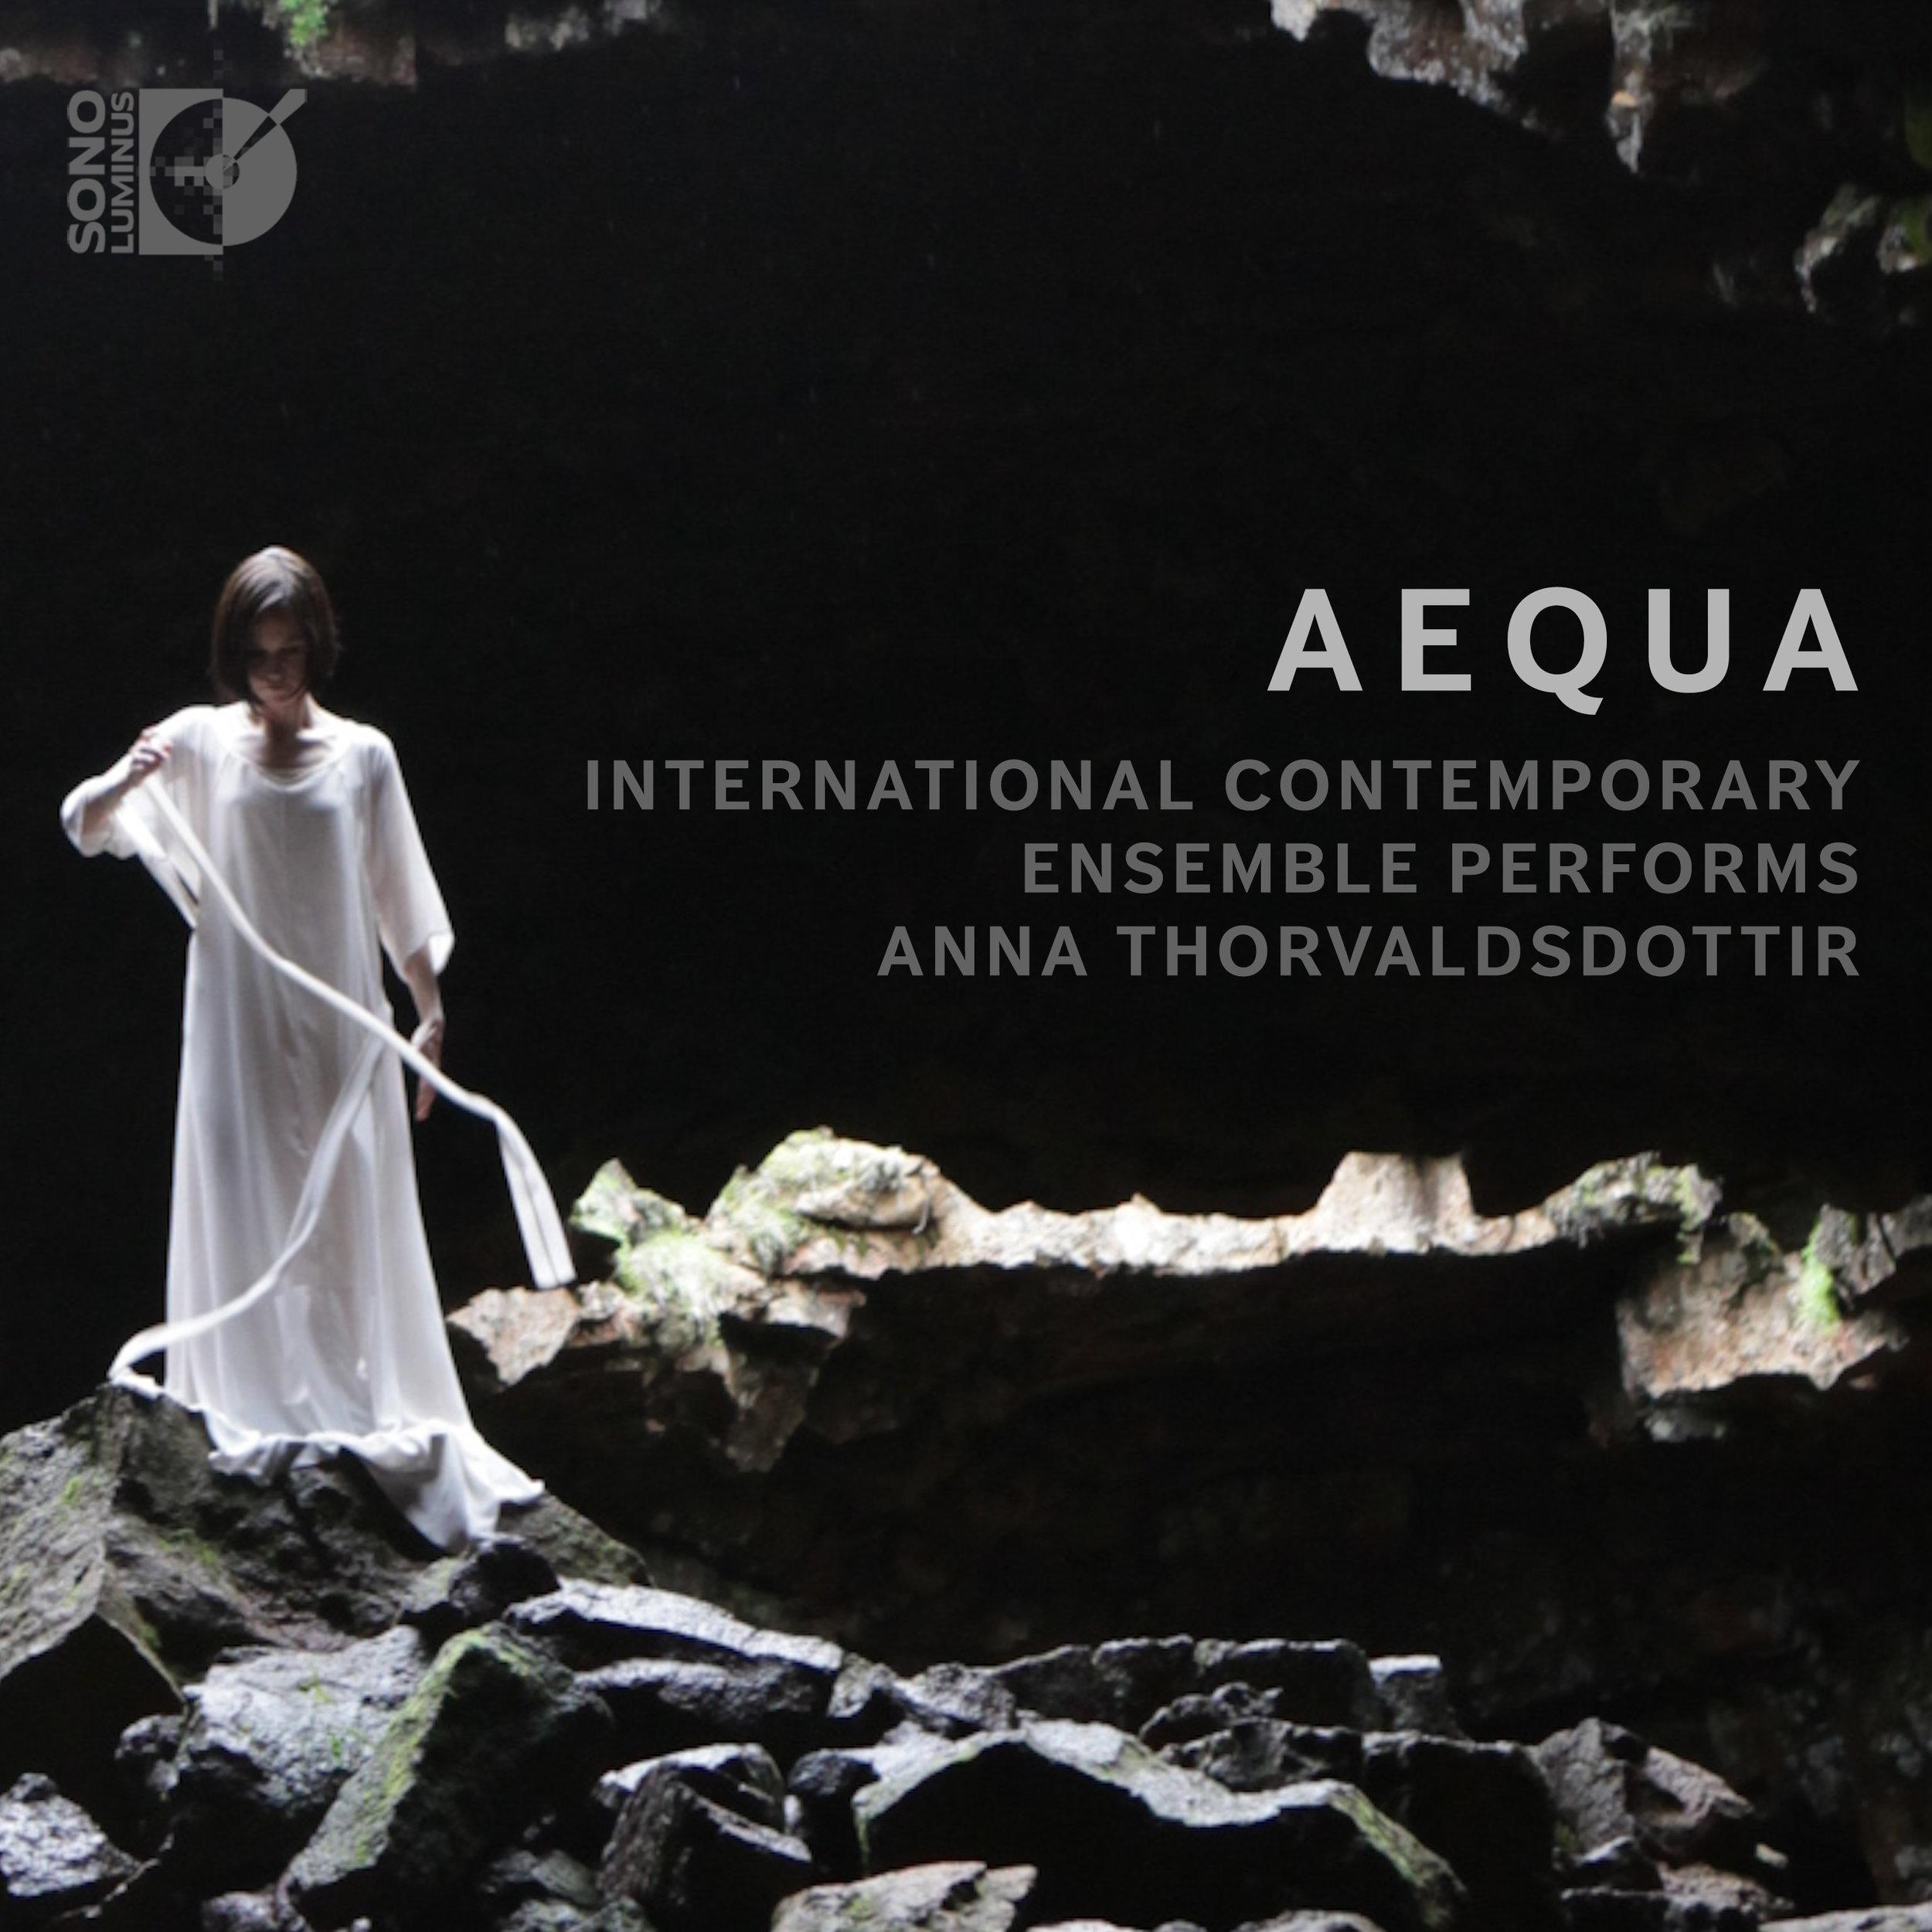 AEQUA_cover.jpg